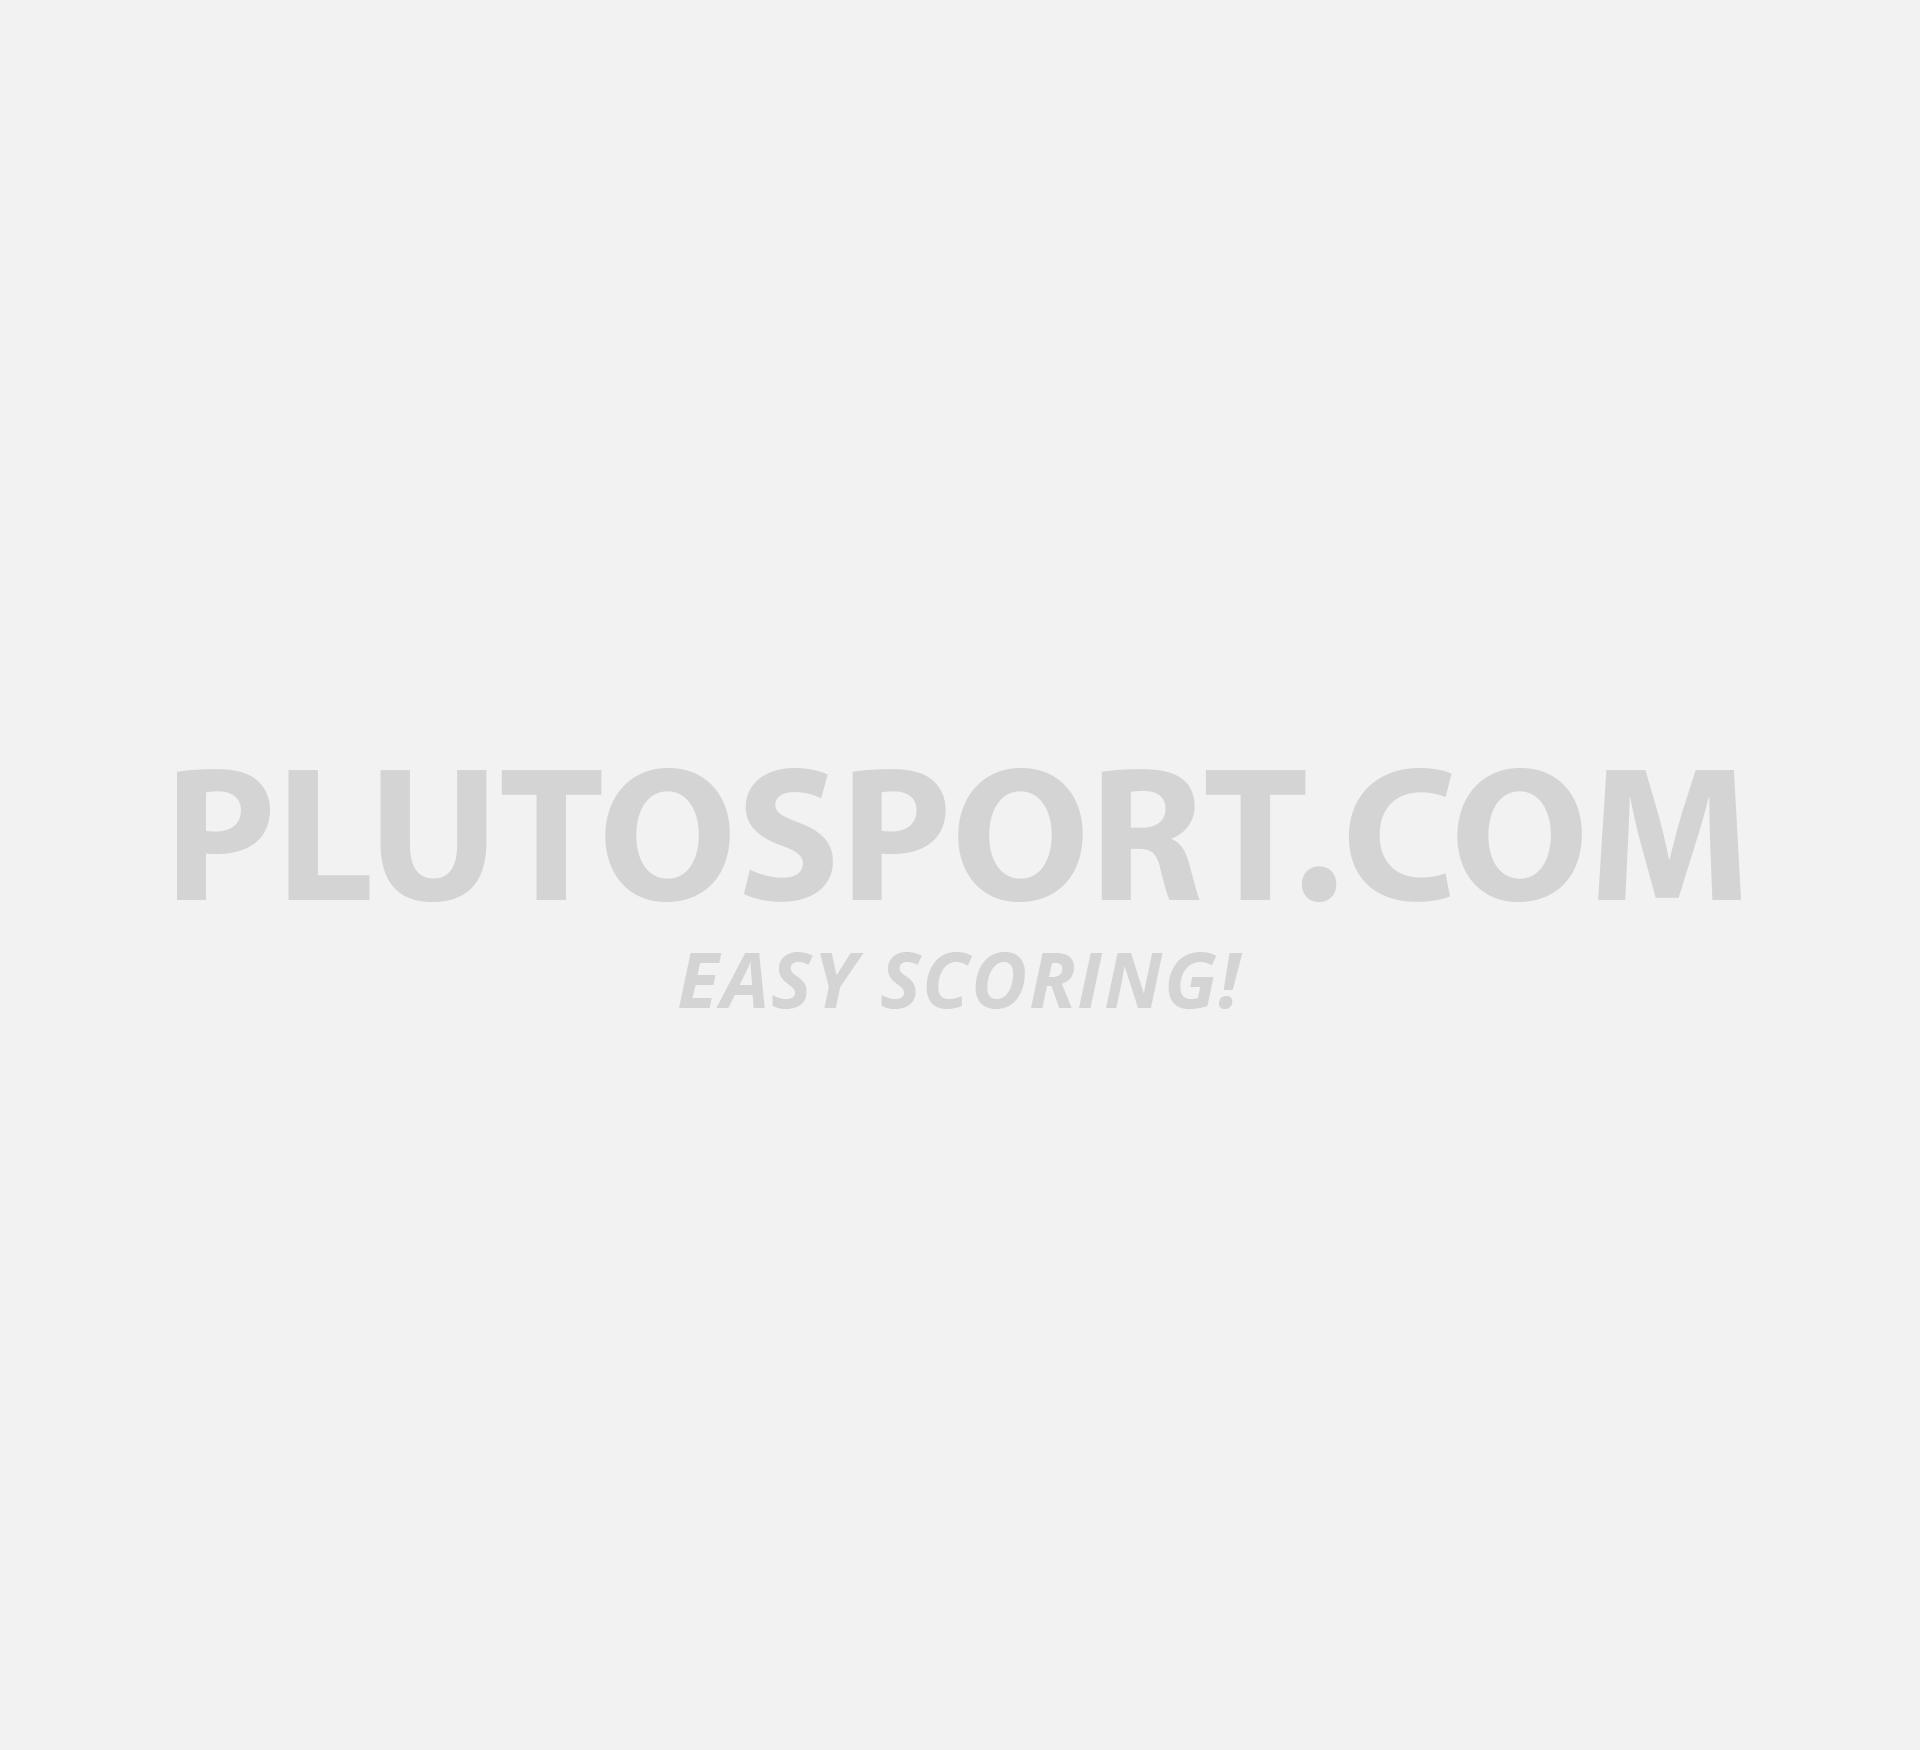 Precision Goalkeeping Glove Wallet